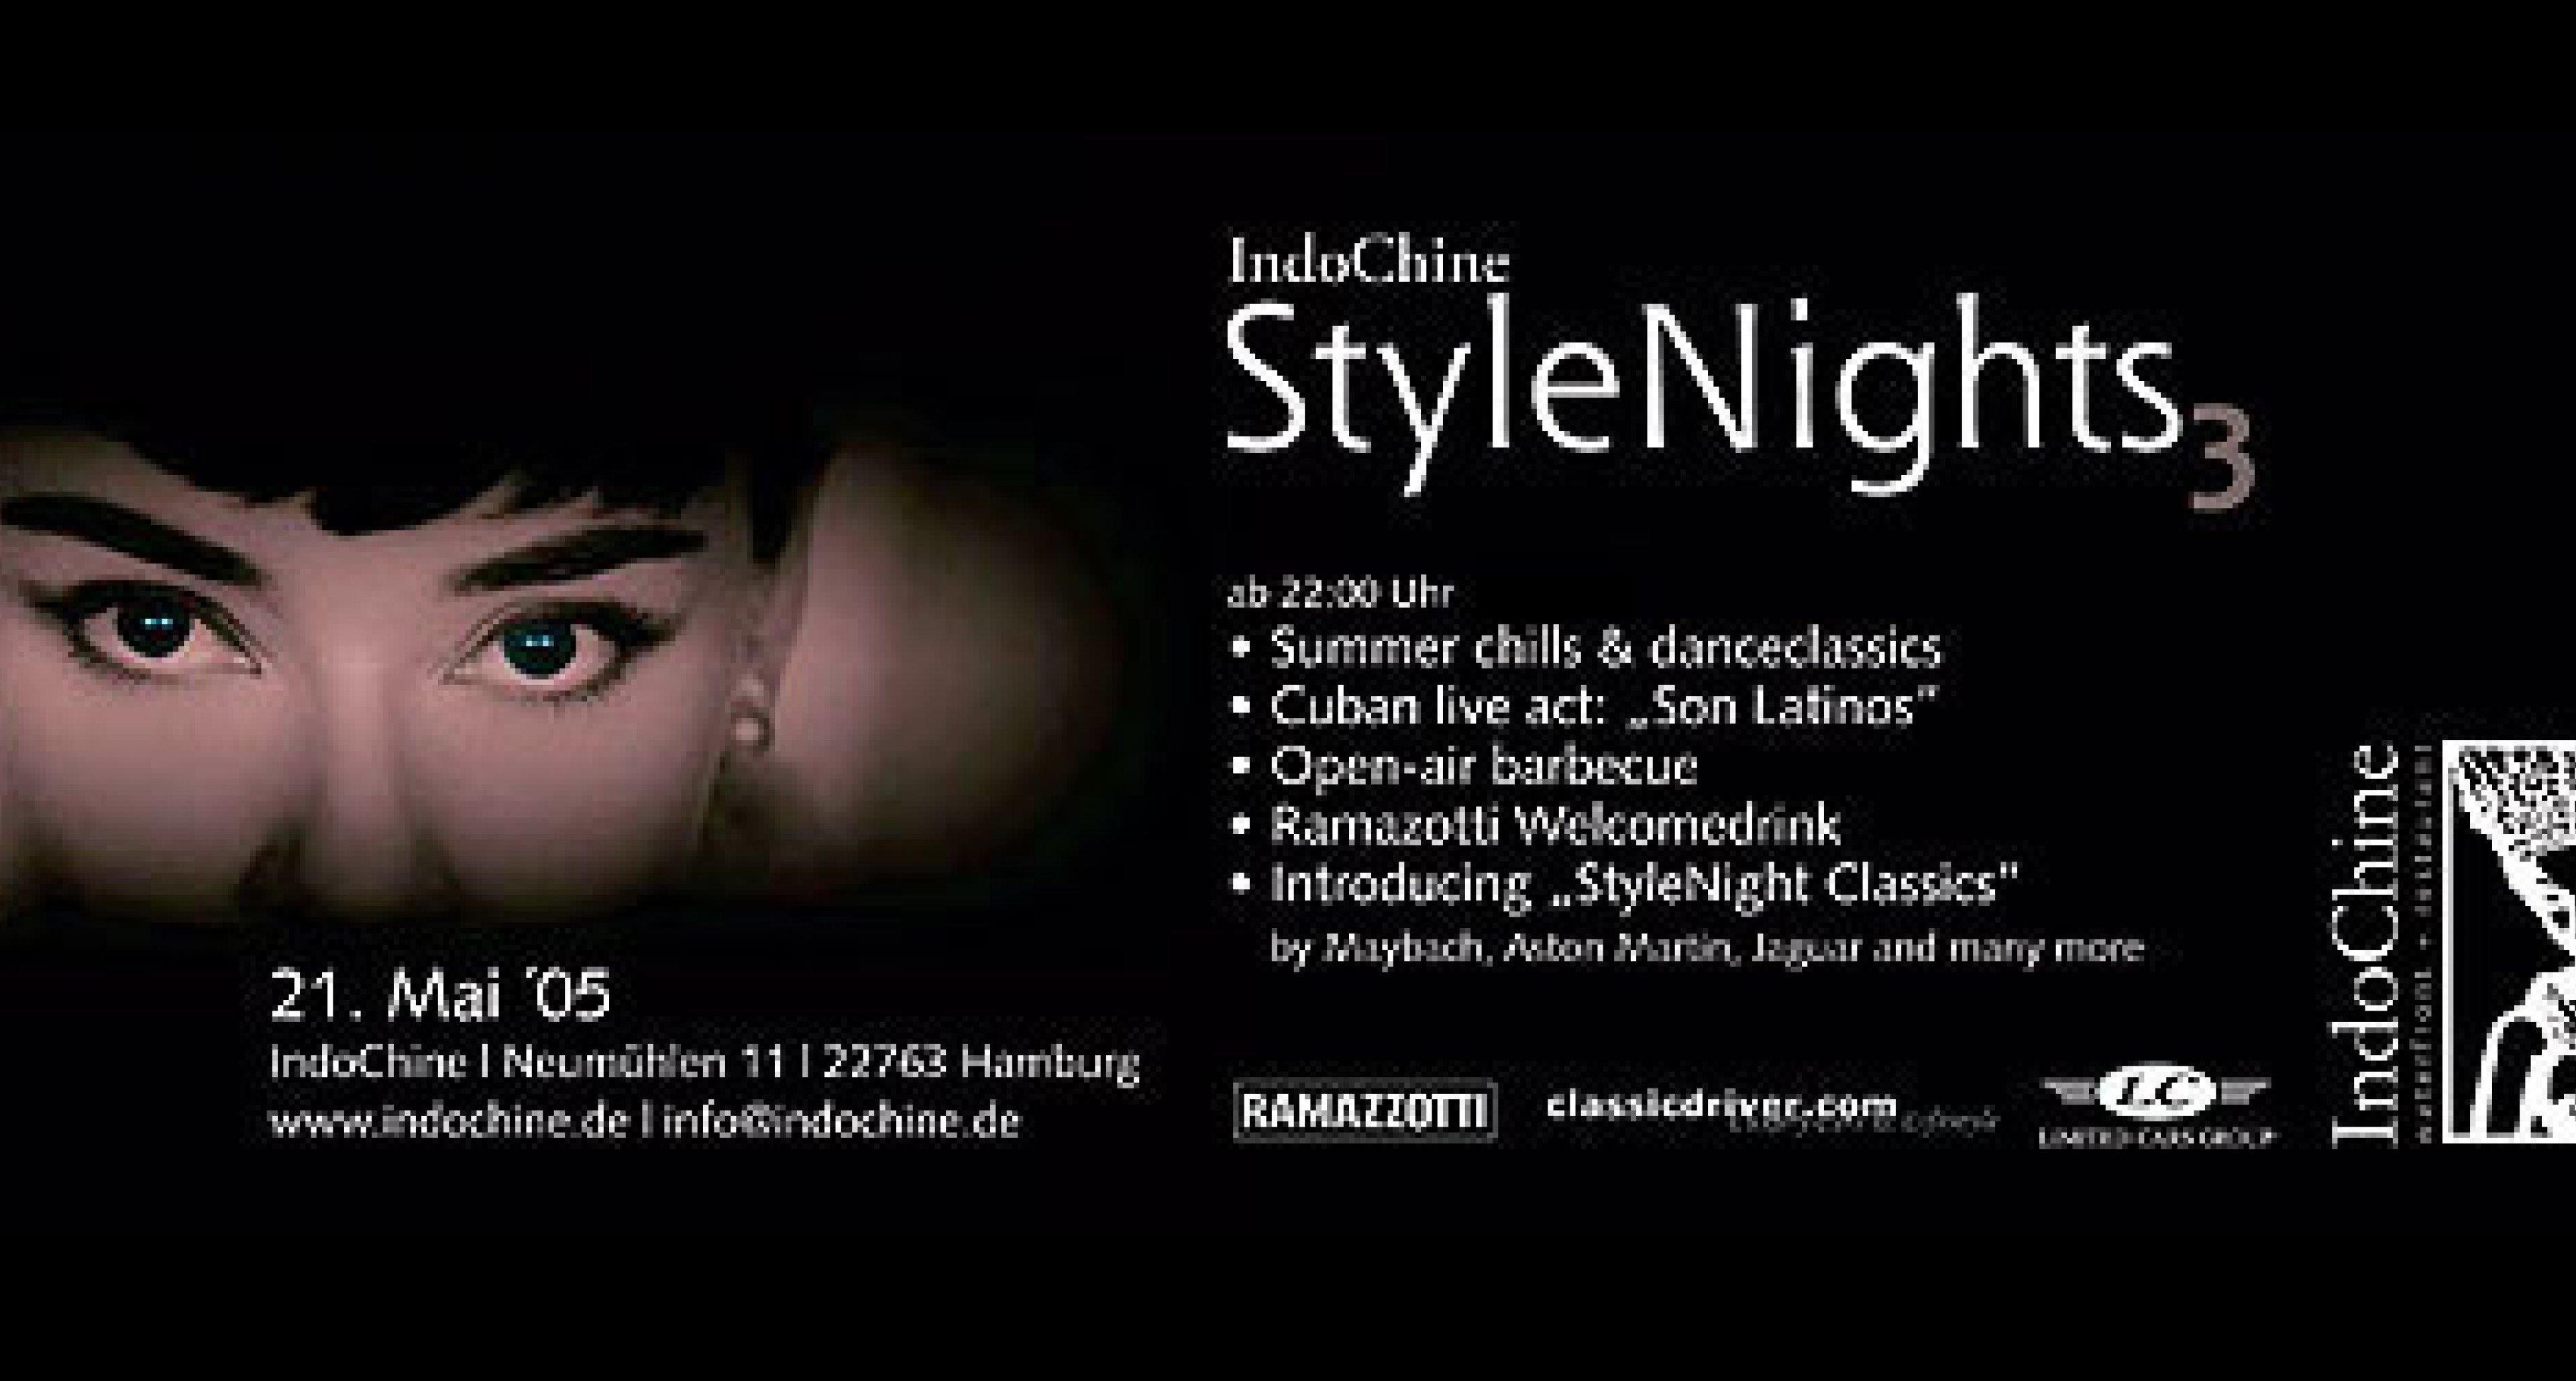 IndoChine Style Nights